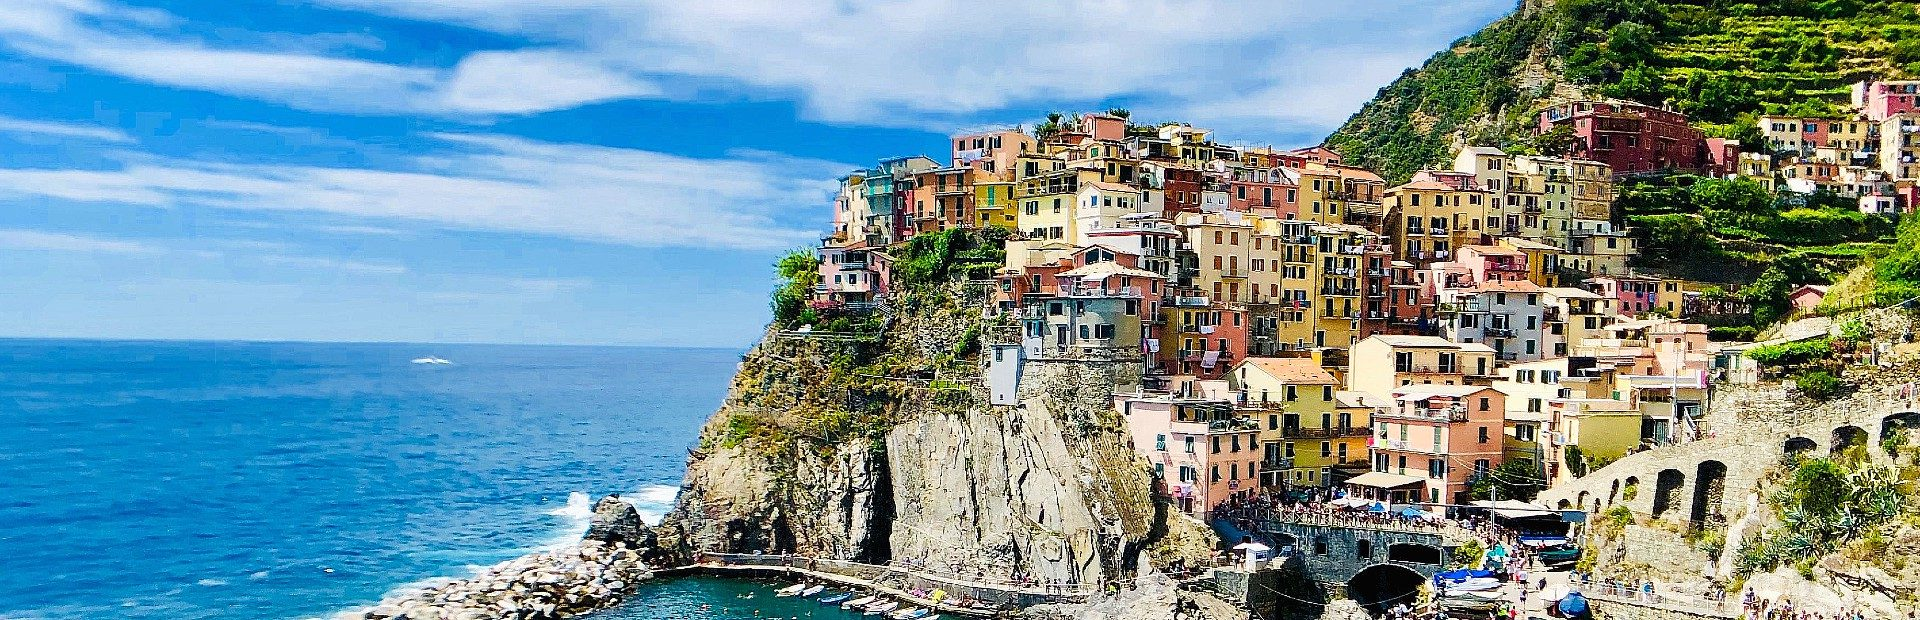 Italië vakantie